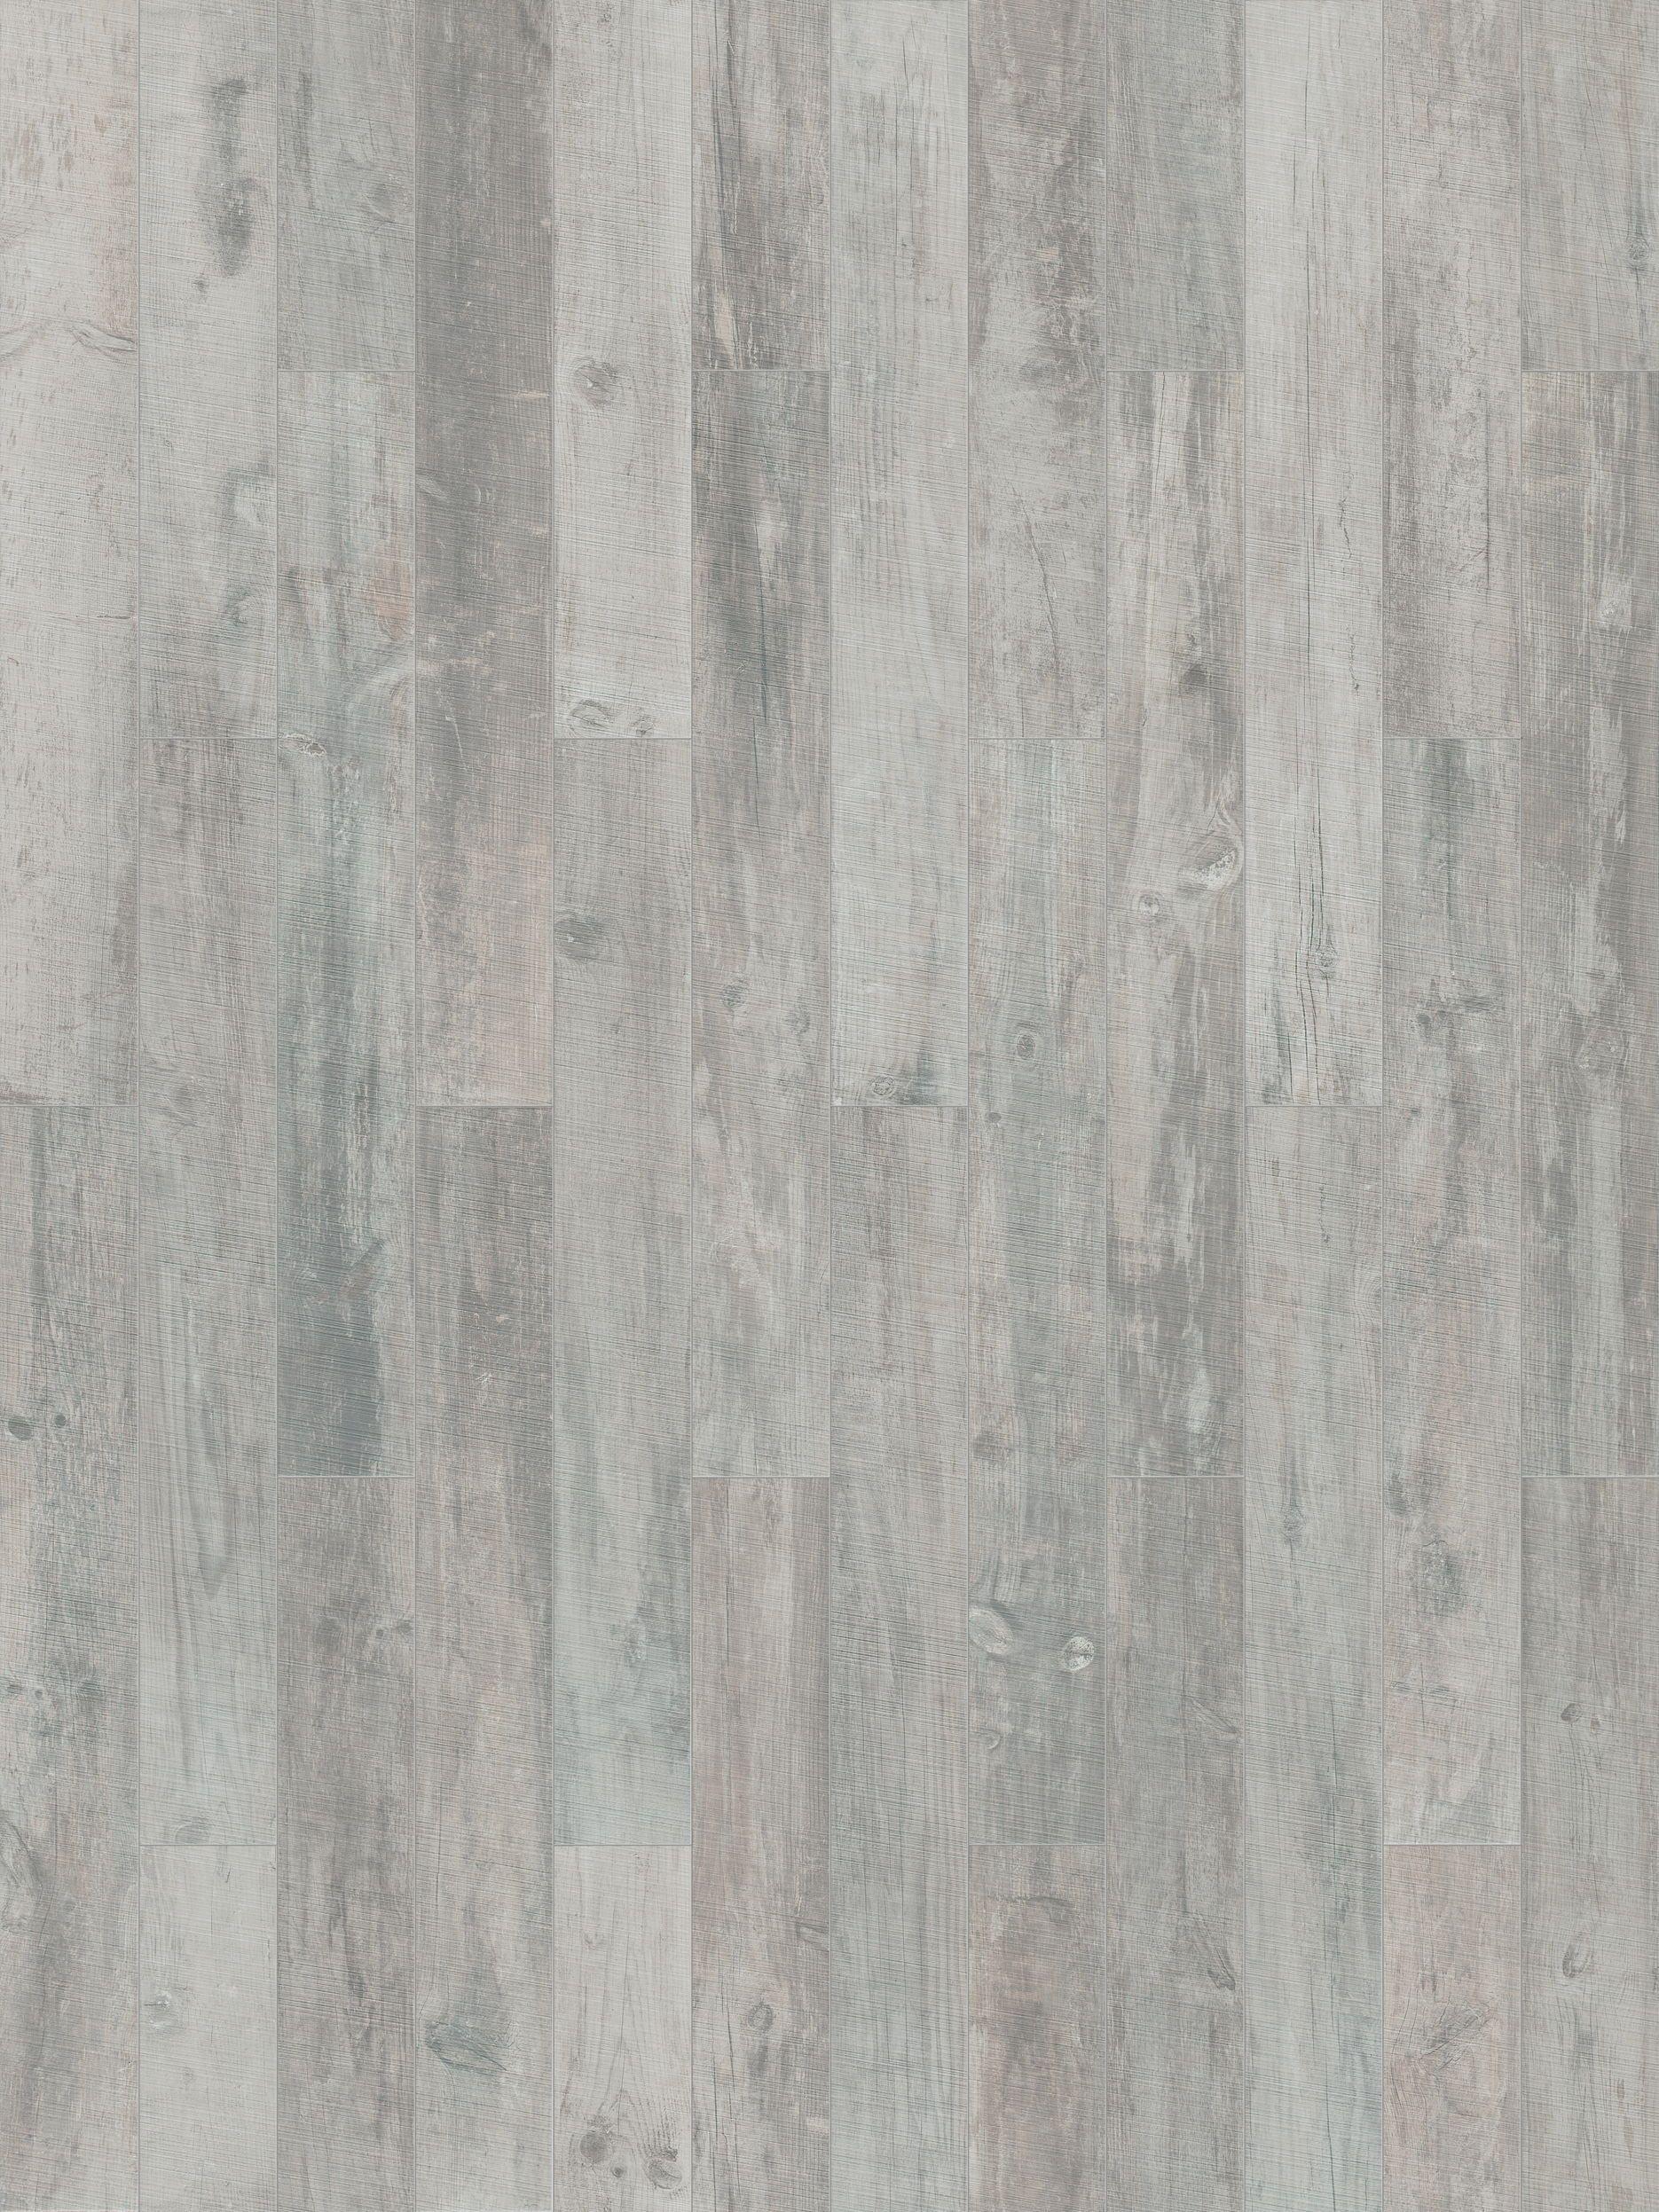 Textured Porcelain Floor Tiles >> From Italy with fervor: Styletech - Floor Gres #new # ...